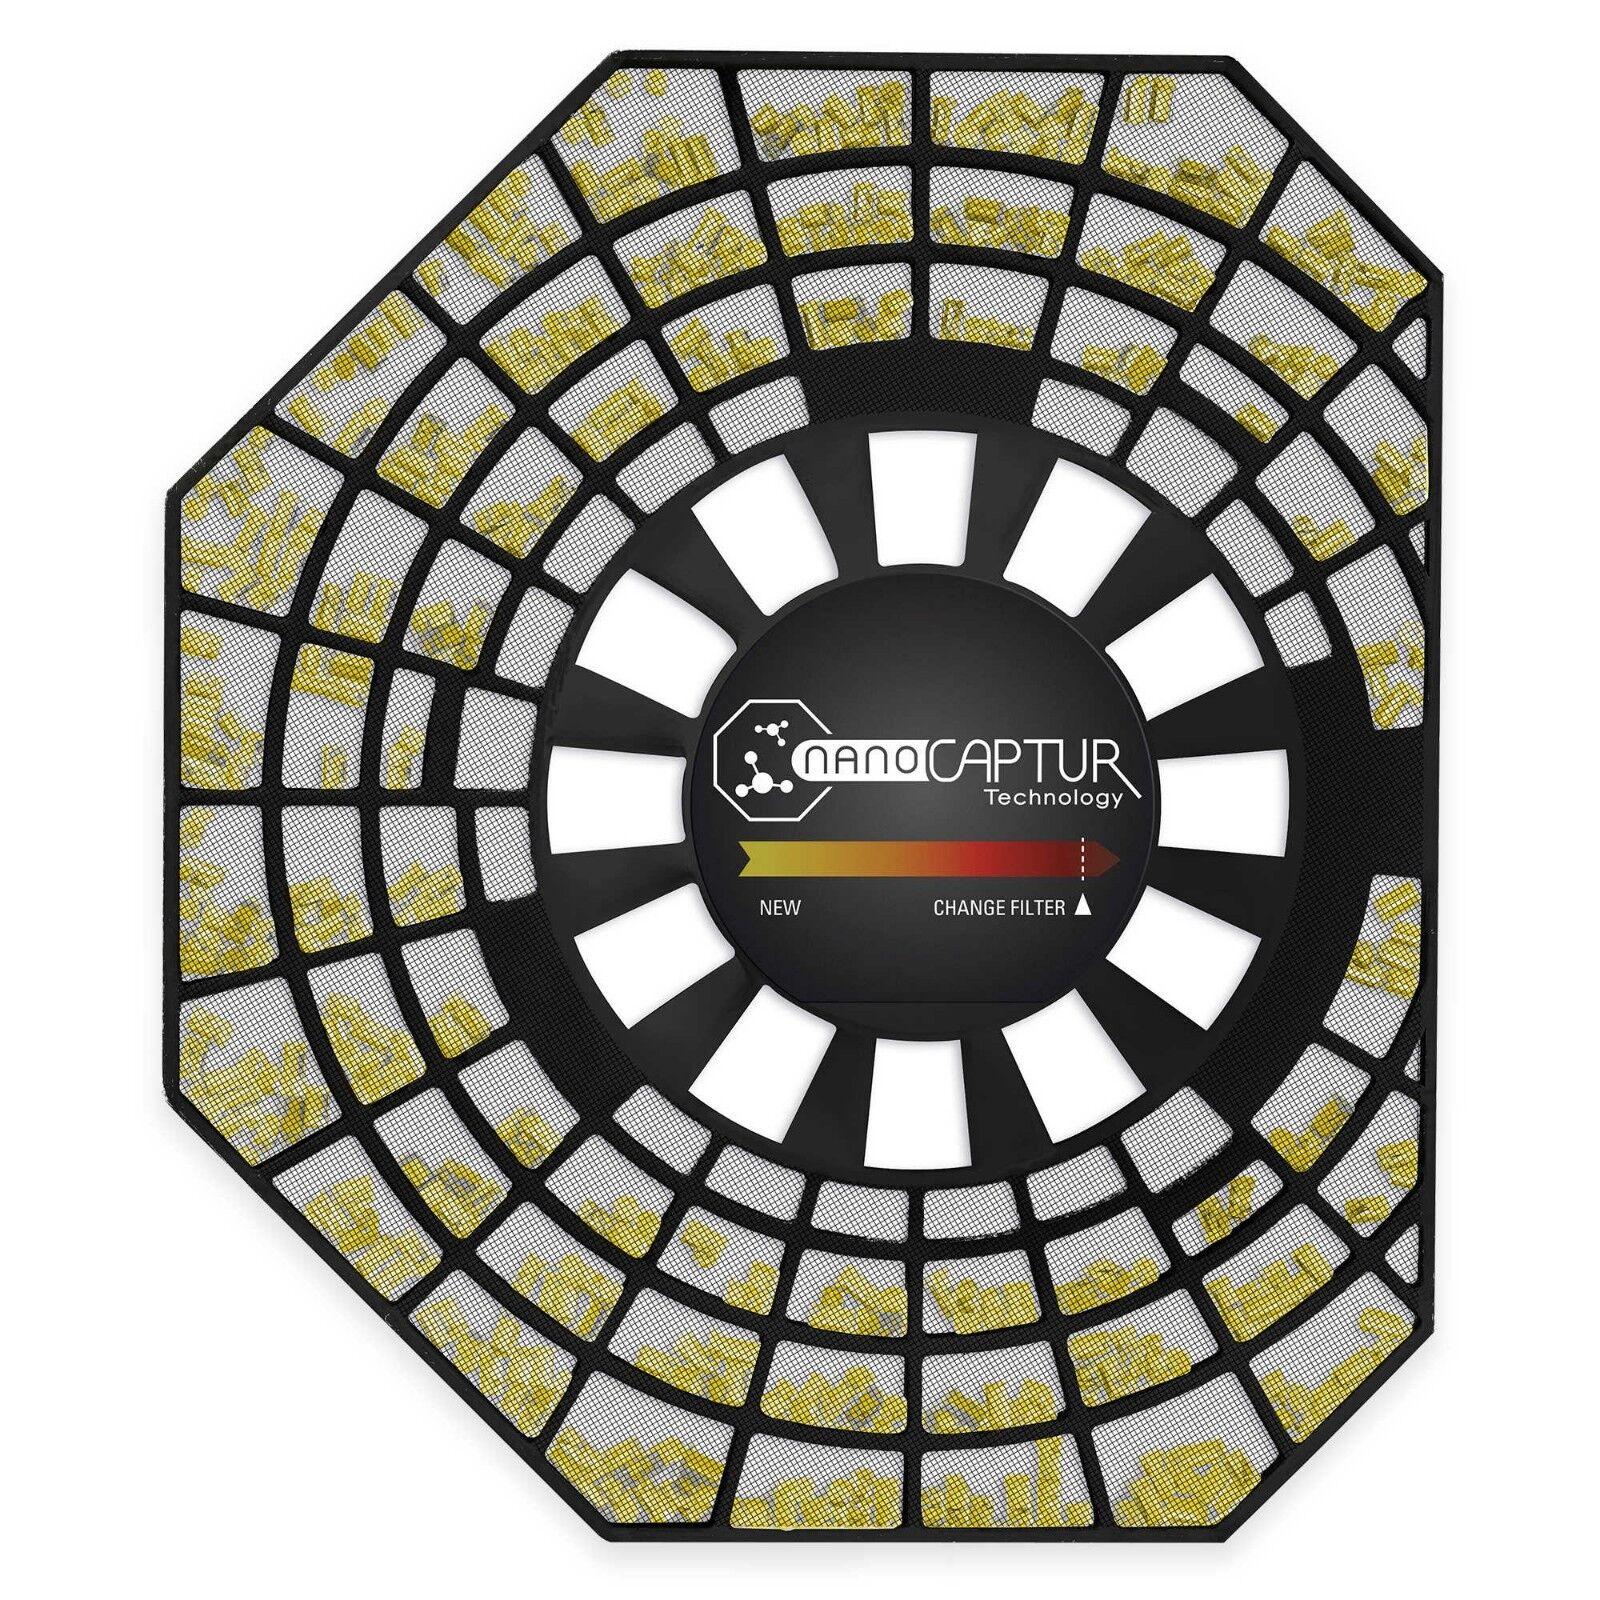 New Nano Captu Technology Filter for Rowenta Intense Pure Air Auto Purifier